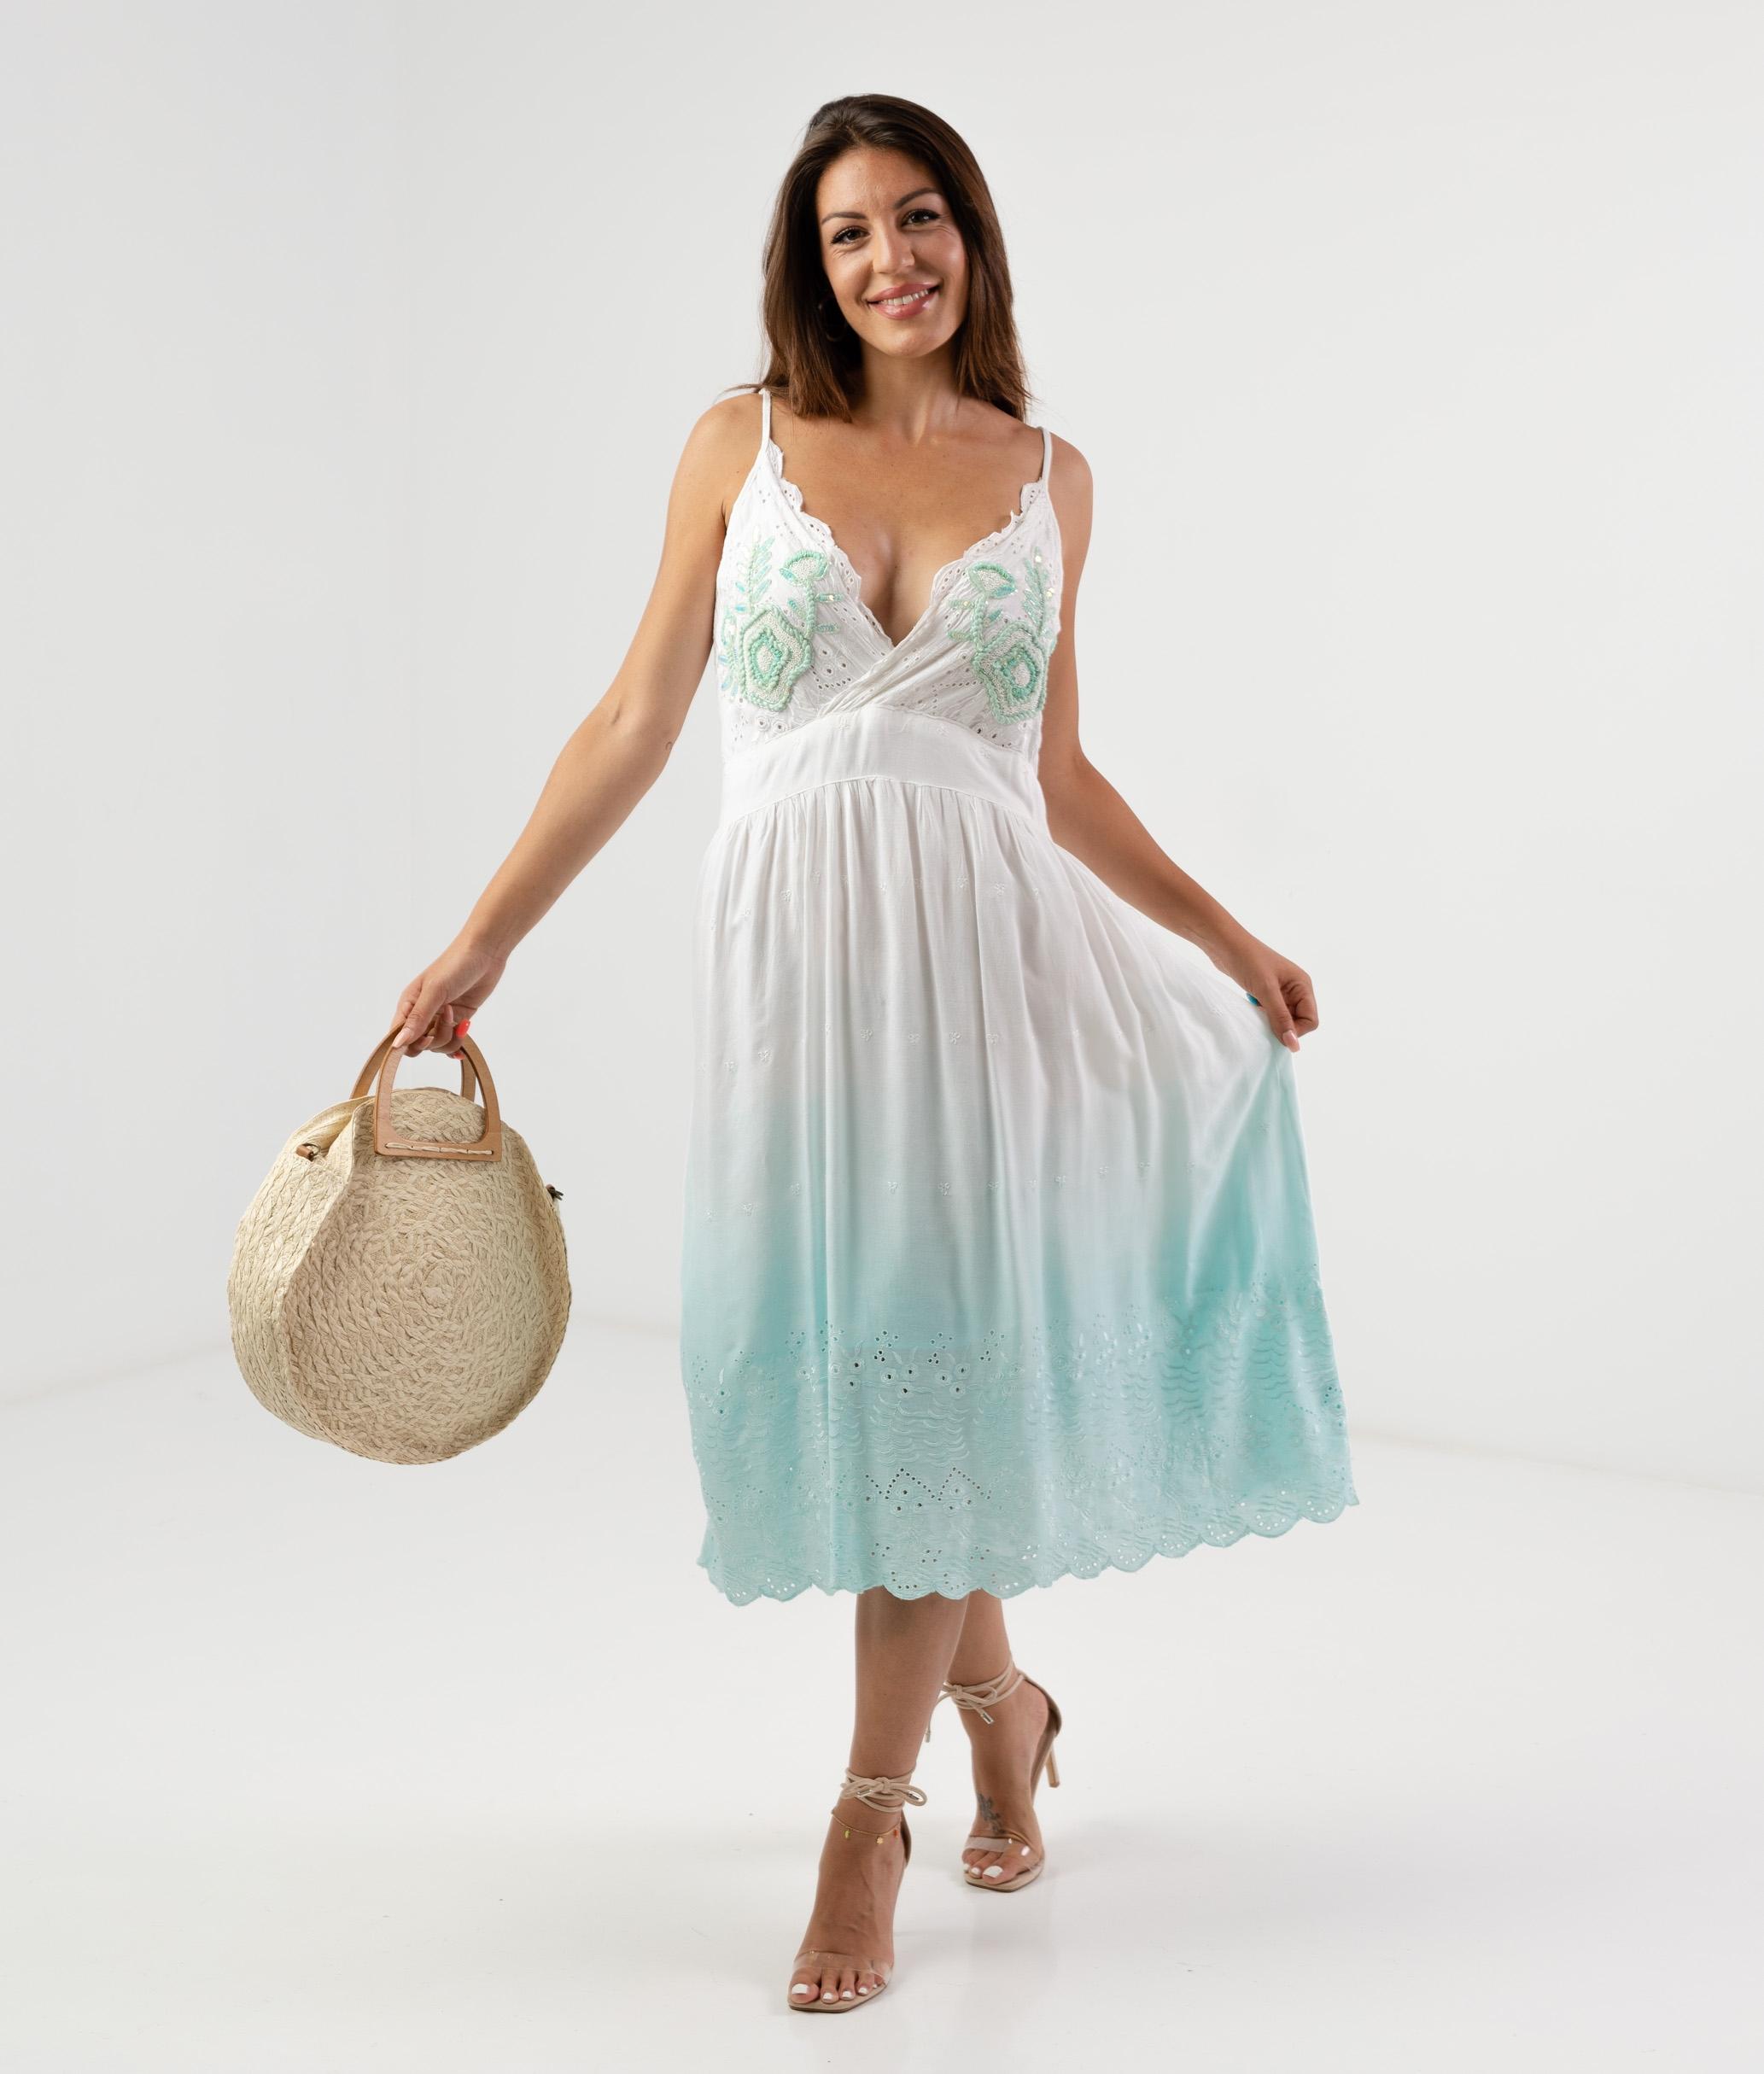 TERBRE DRESS - BLUE